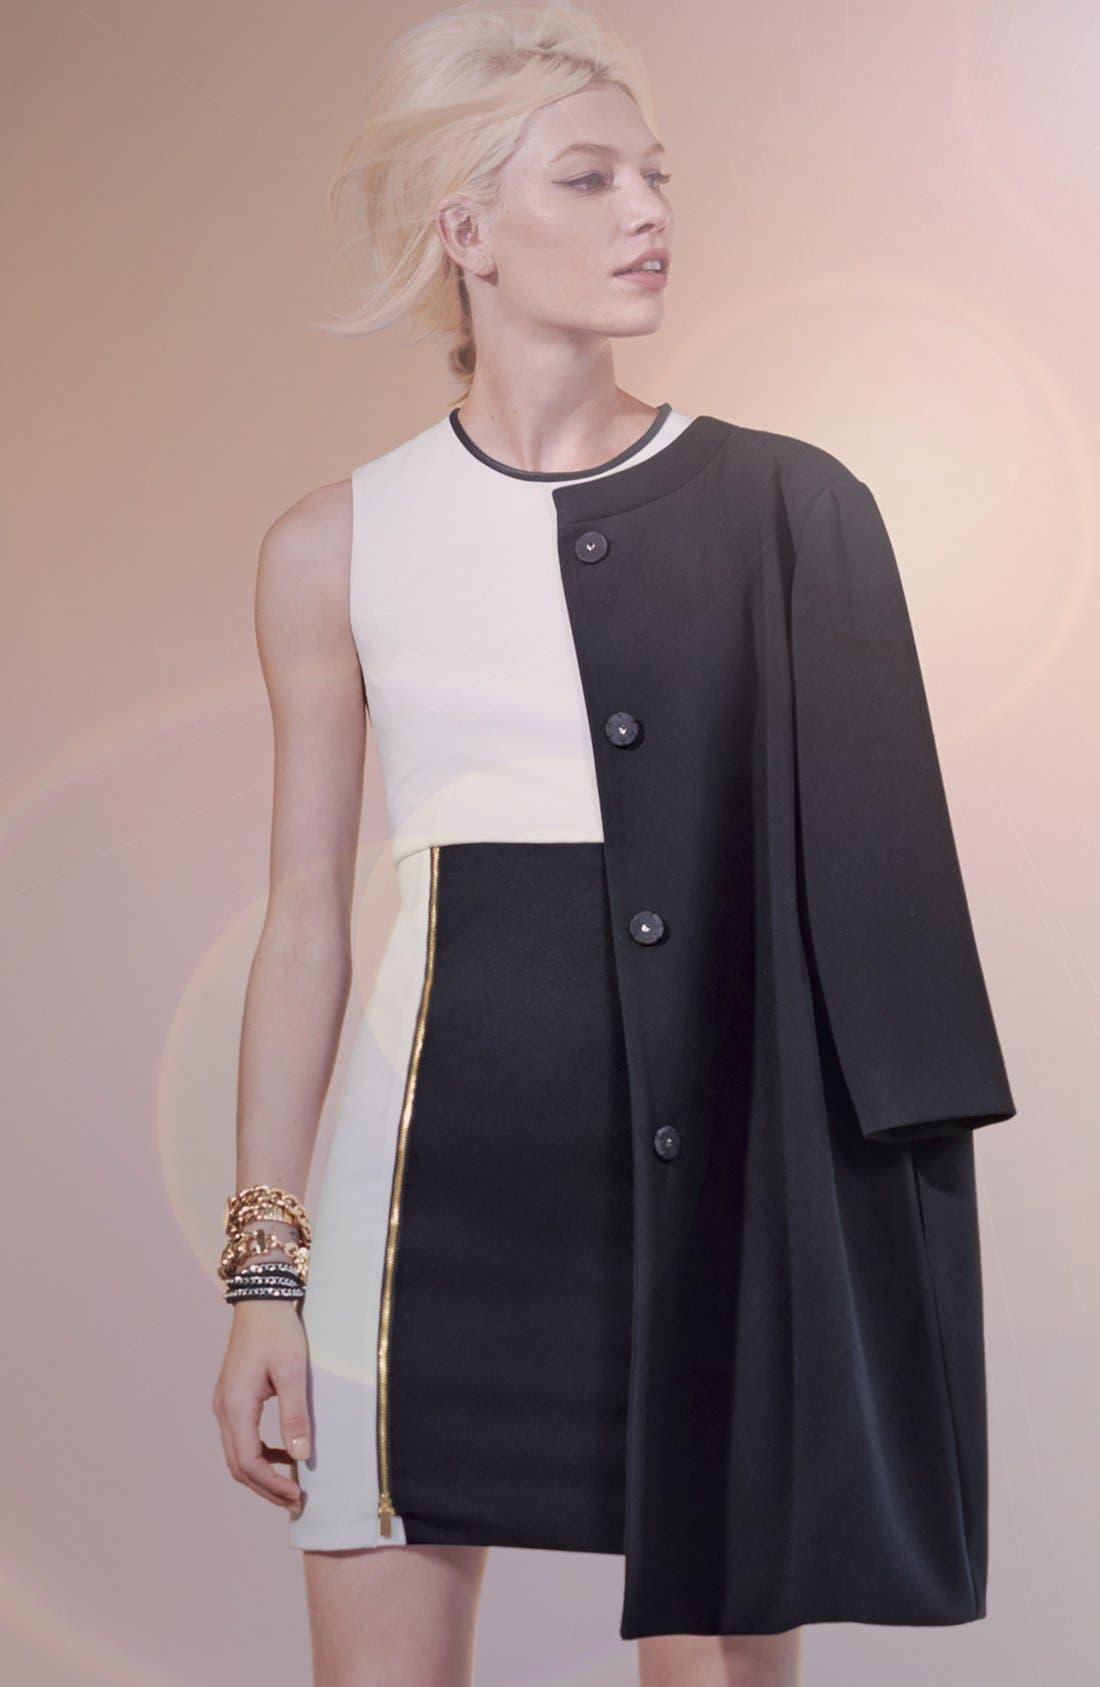 Main Image - Vince Camuto Coat & Colorblock Sheath Dress